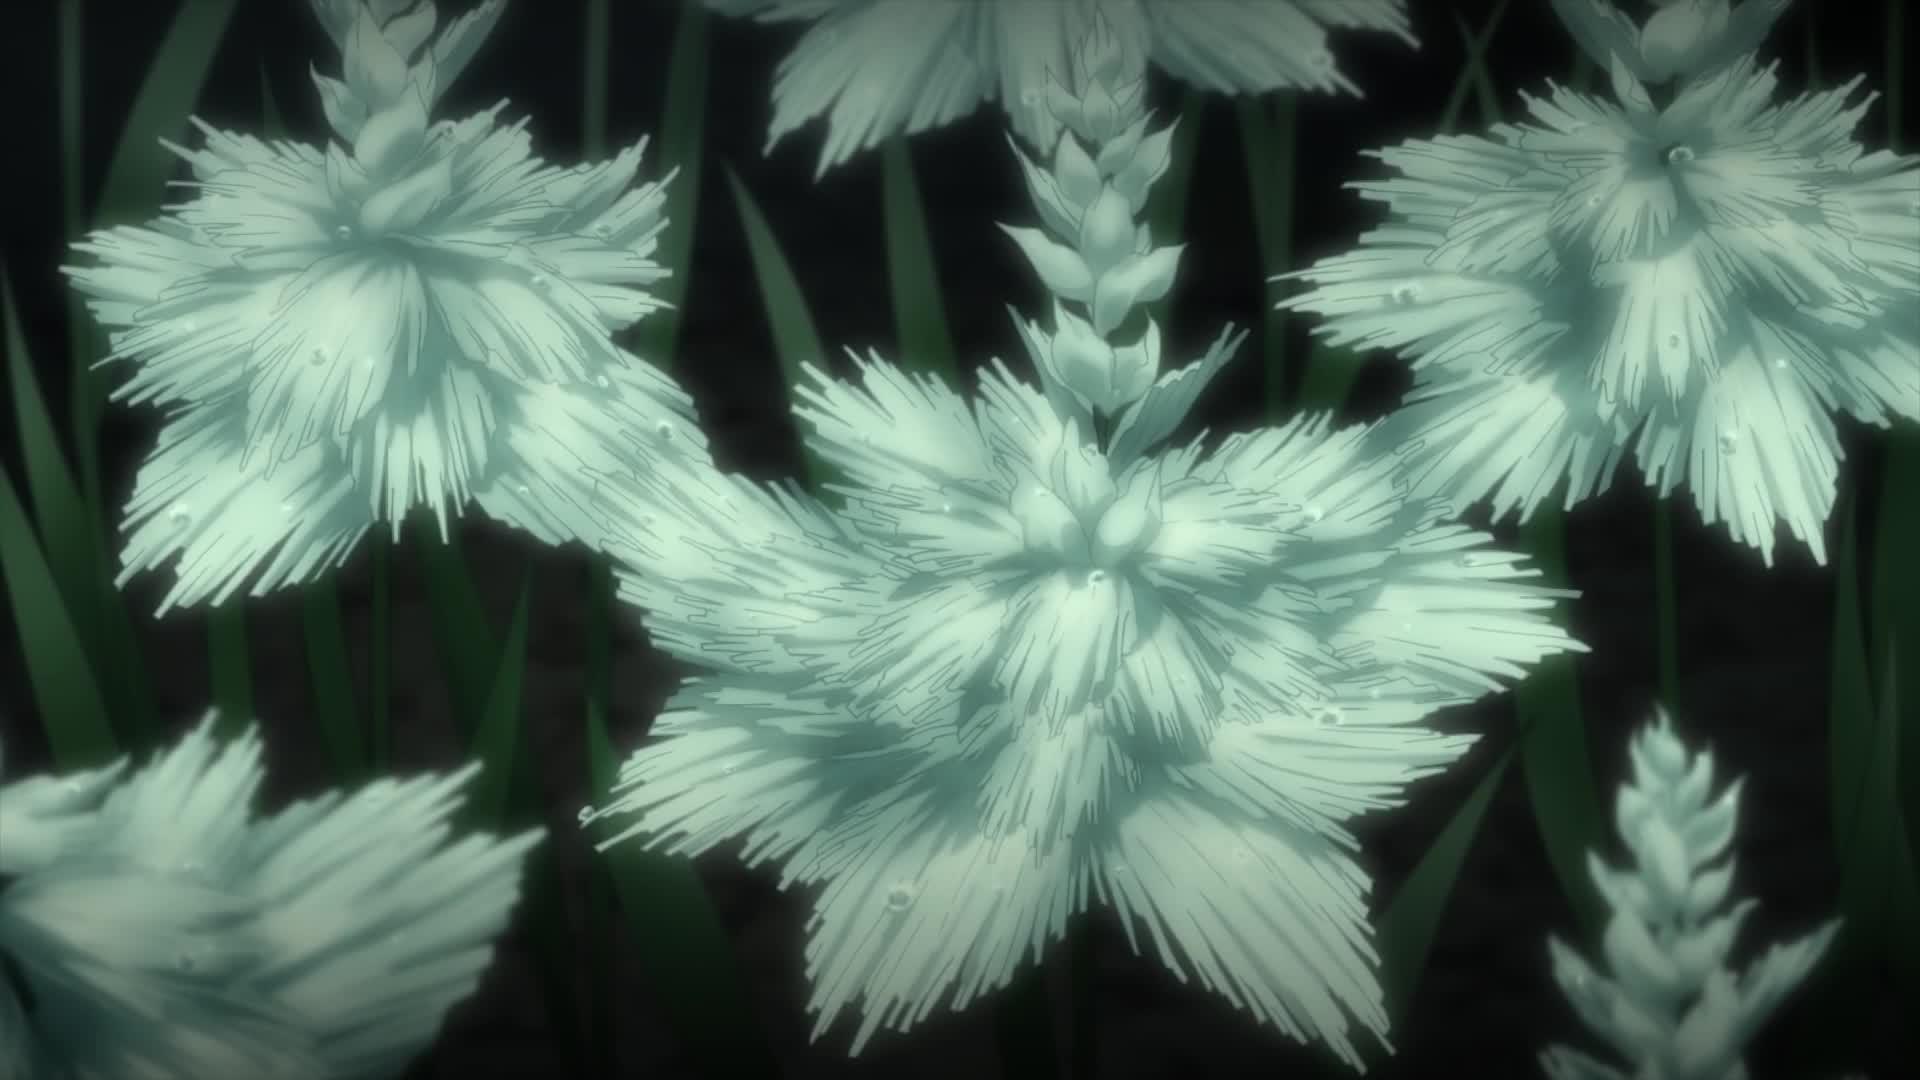 Final Fantasy Xv Episode Ardyn Gifs Search   Search & Share